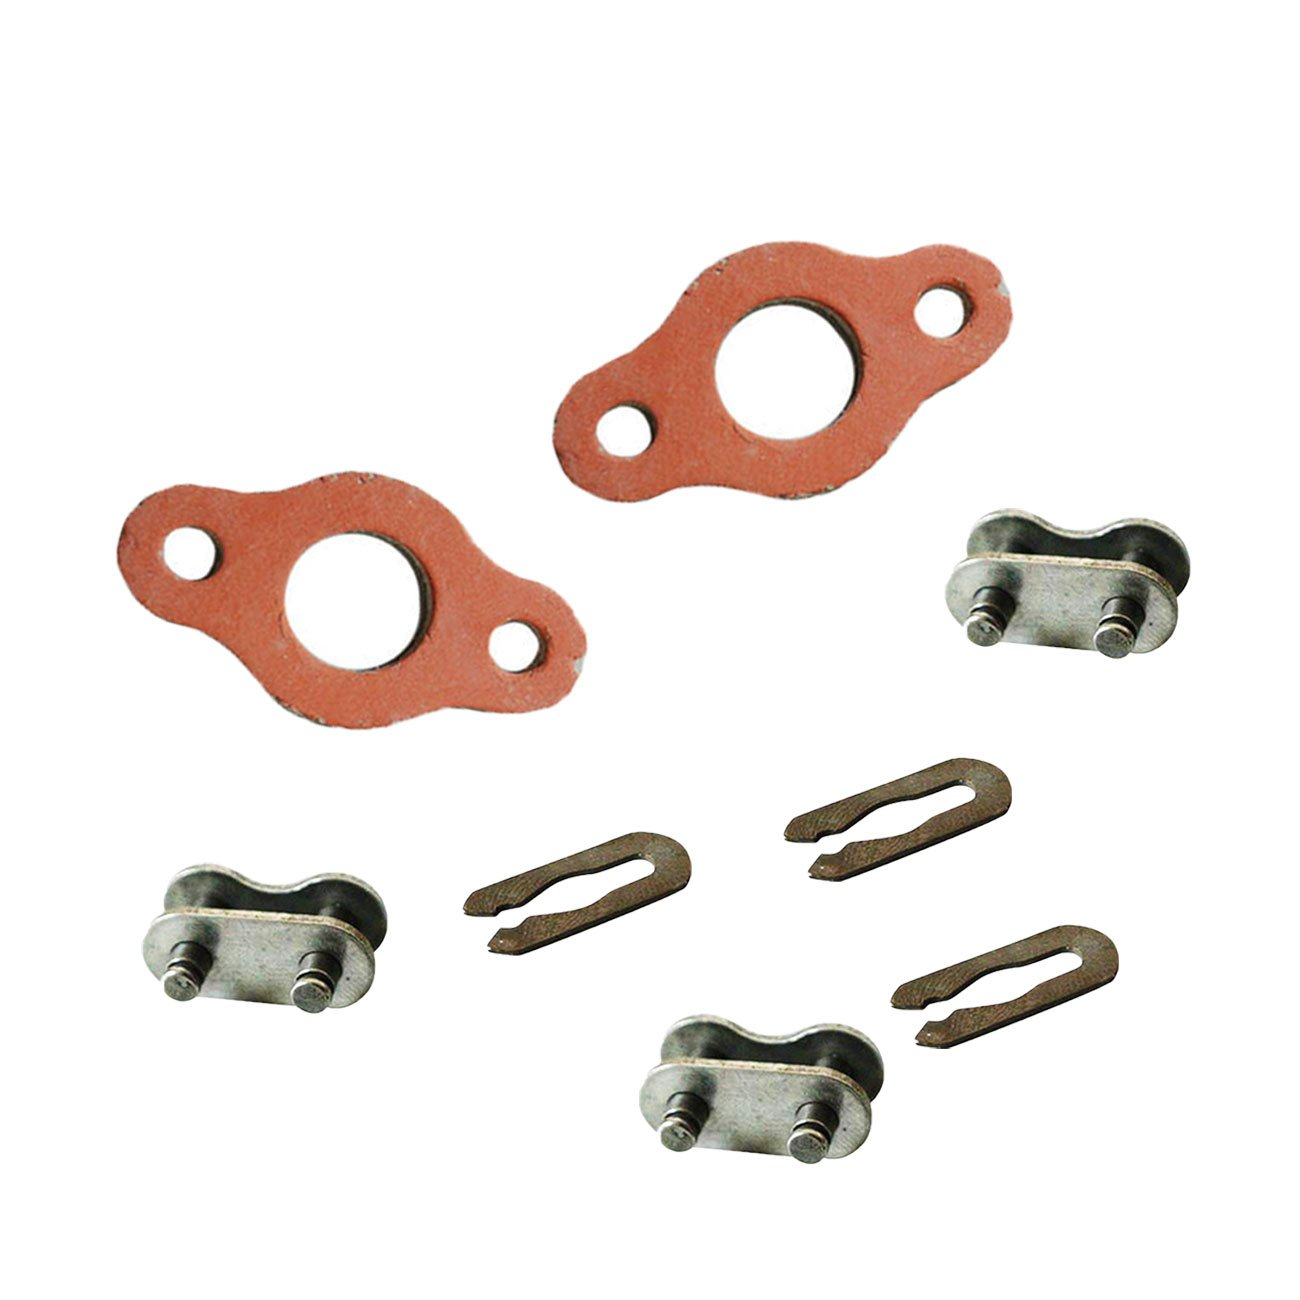 New 3xChain Master Link/&1 Set Gasket Fits 49//66//80cc 2 Stroke Engine Motorized Bike